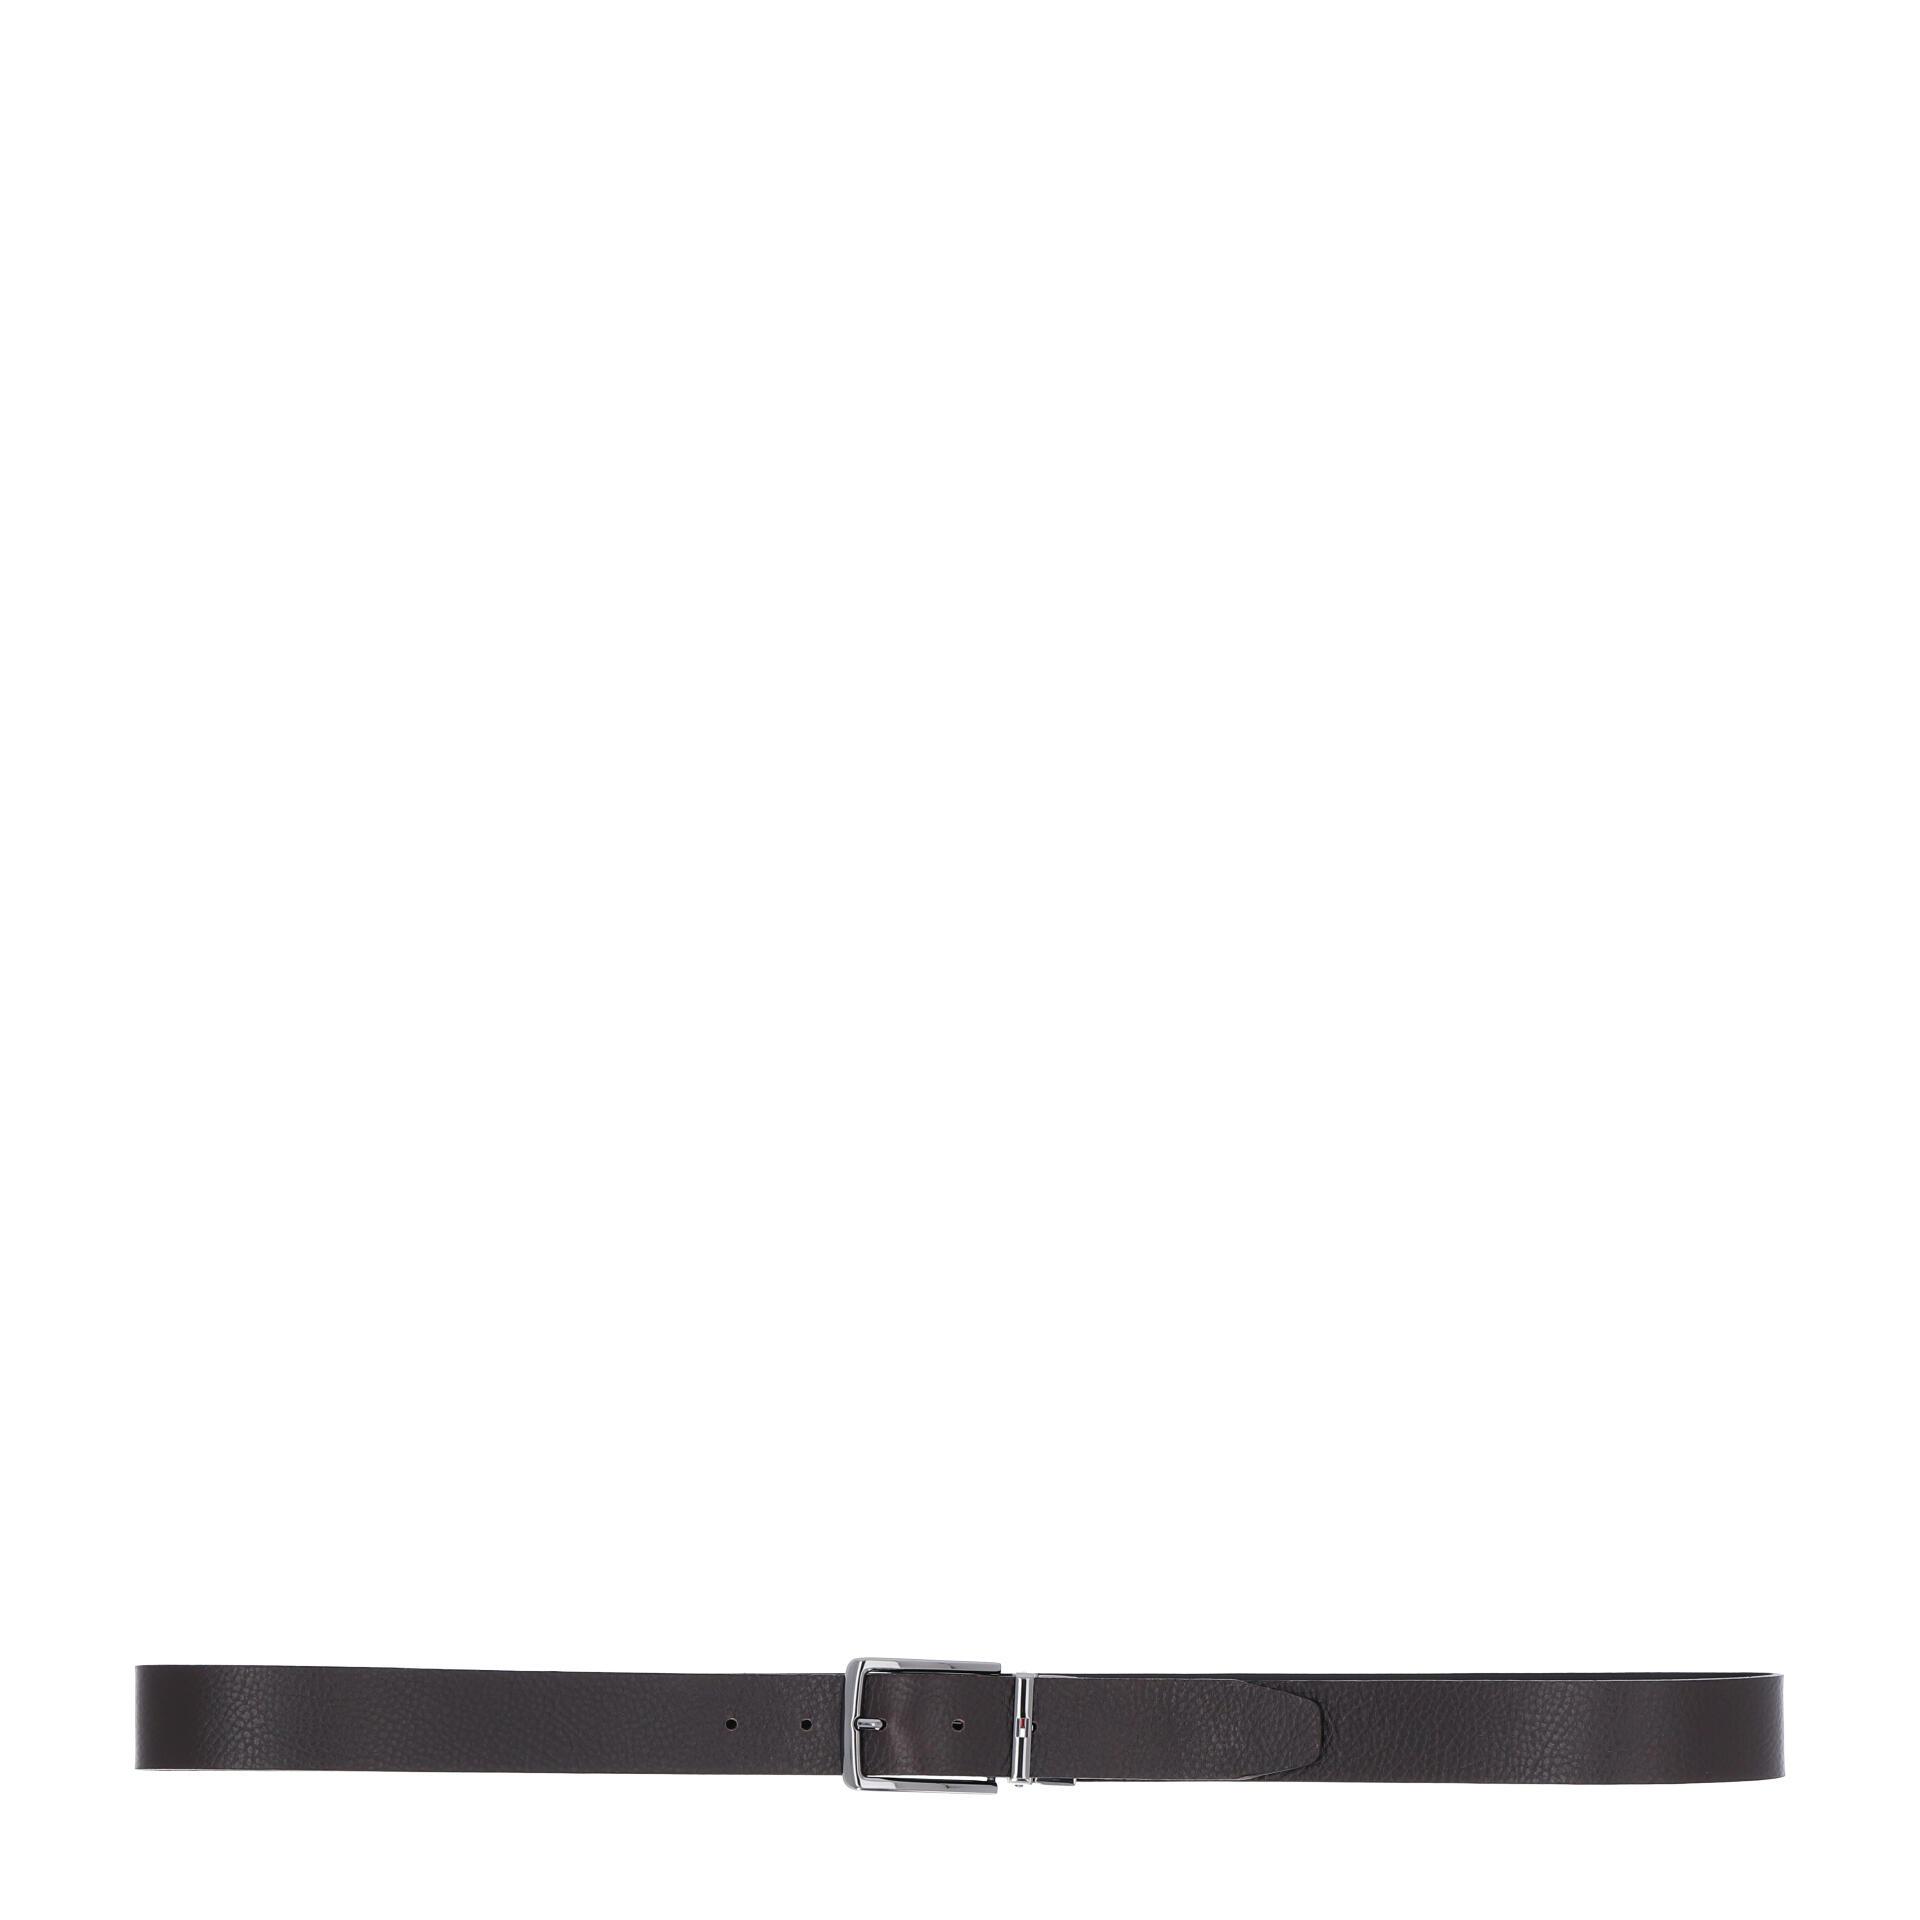 Tommy Hilfiger Denton Leather Gürtel 115 cm testa di moro/black